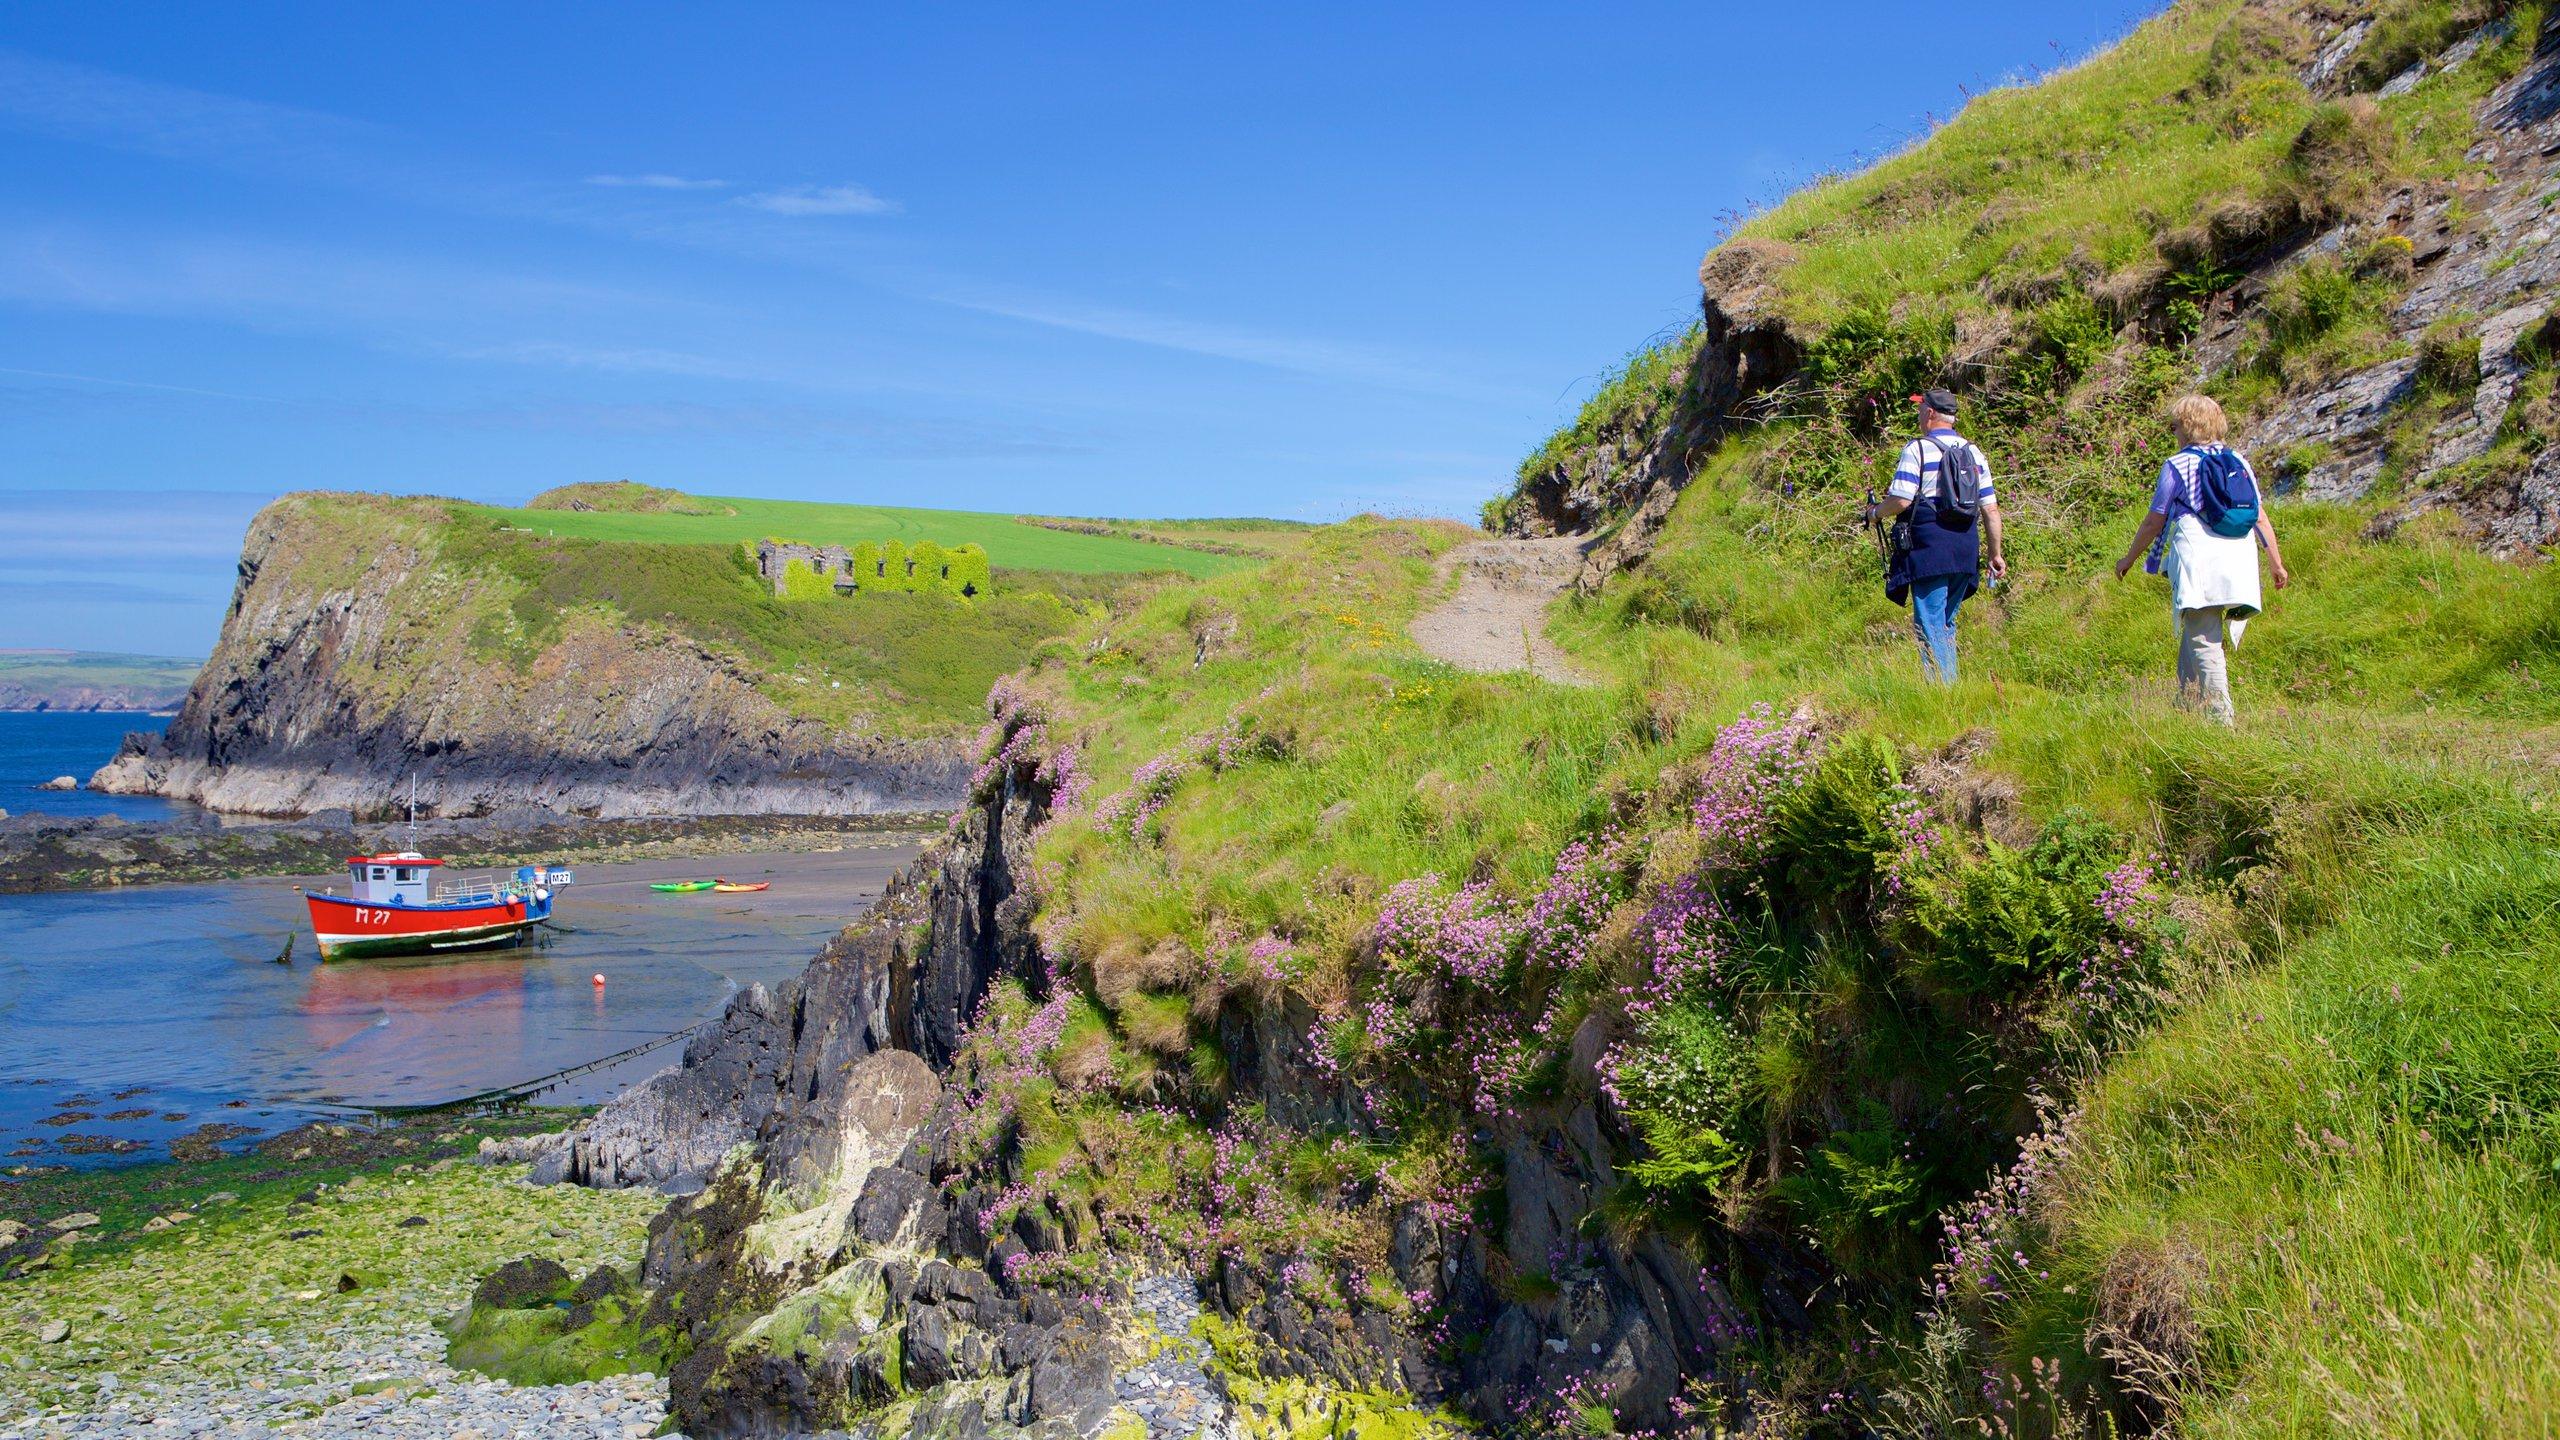 Pembrokeshire Coast National Park, Haverfordwest, Wales, United Kingdom